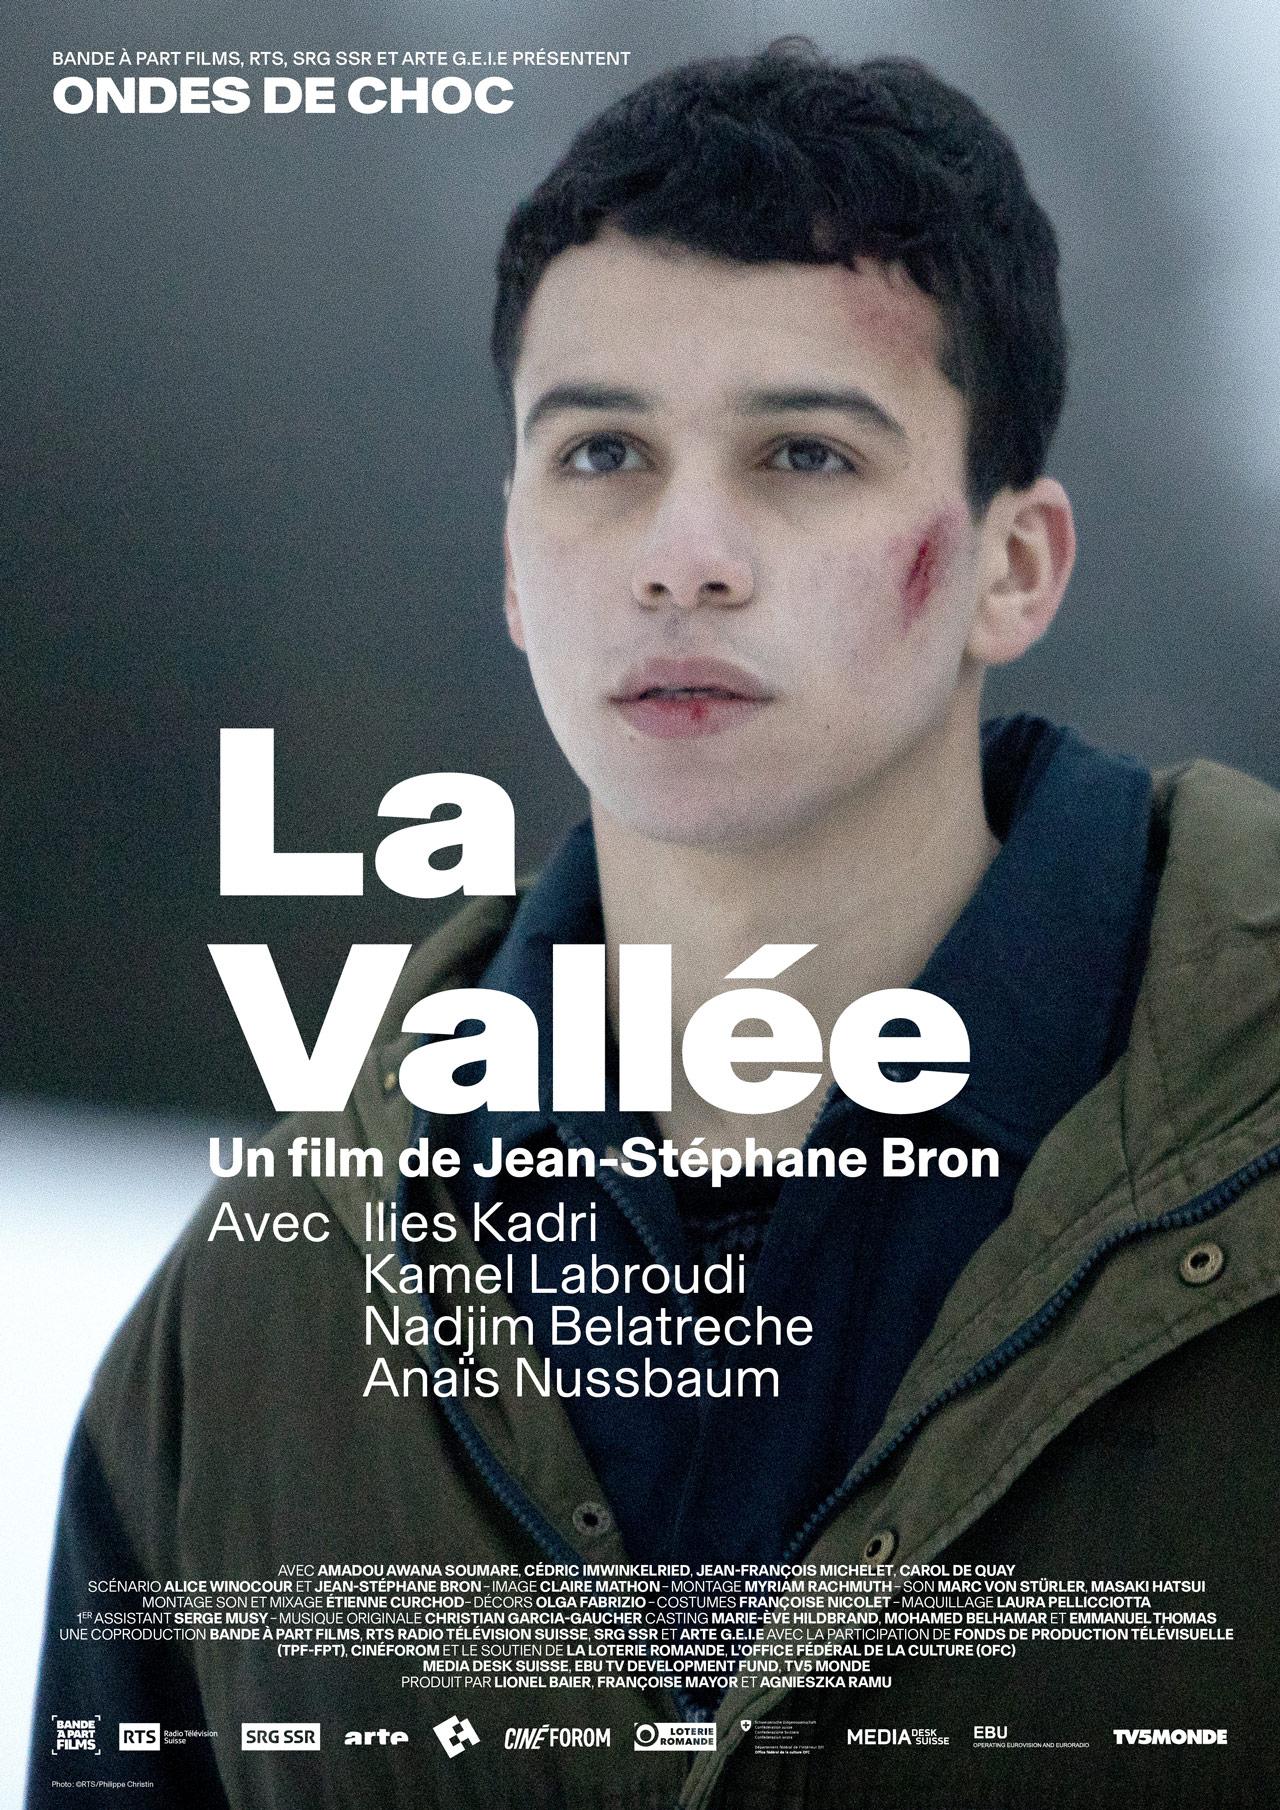 Ondes de choc [1] : La vallée